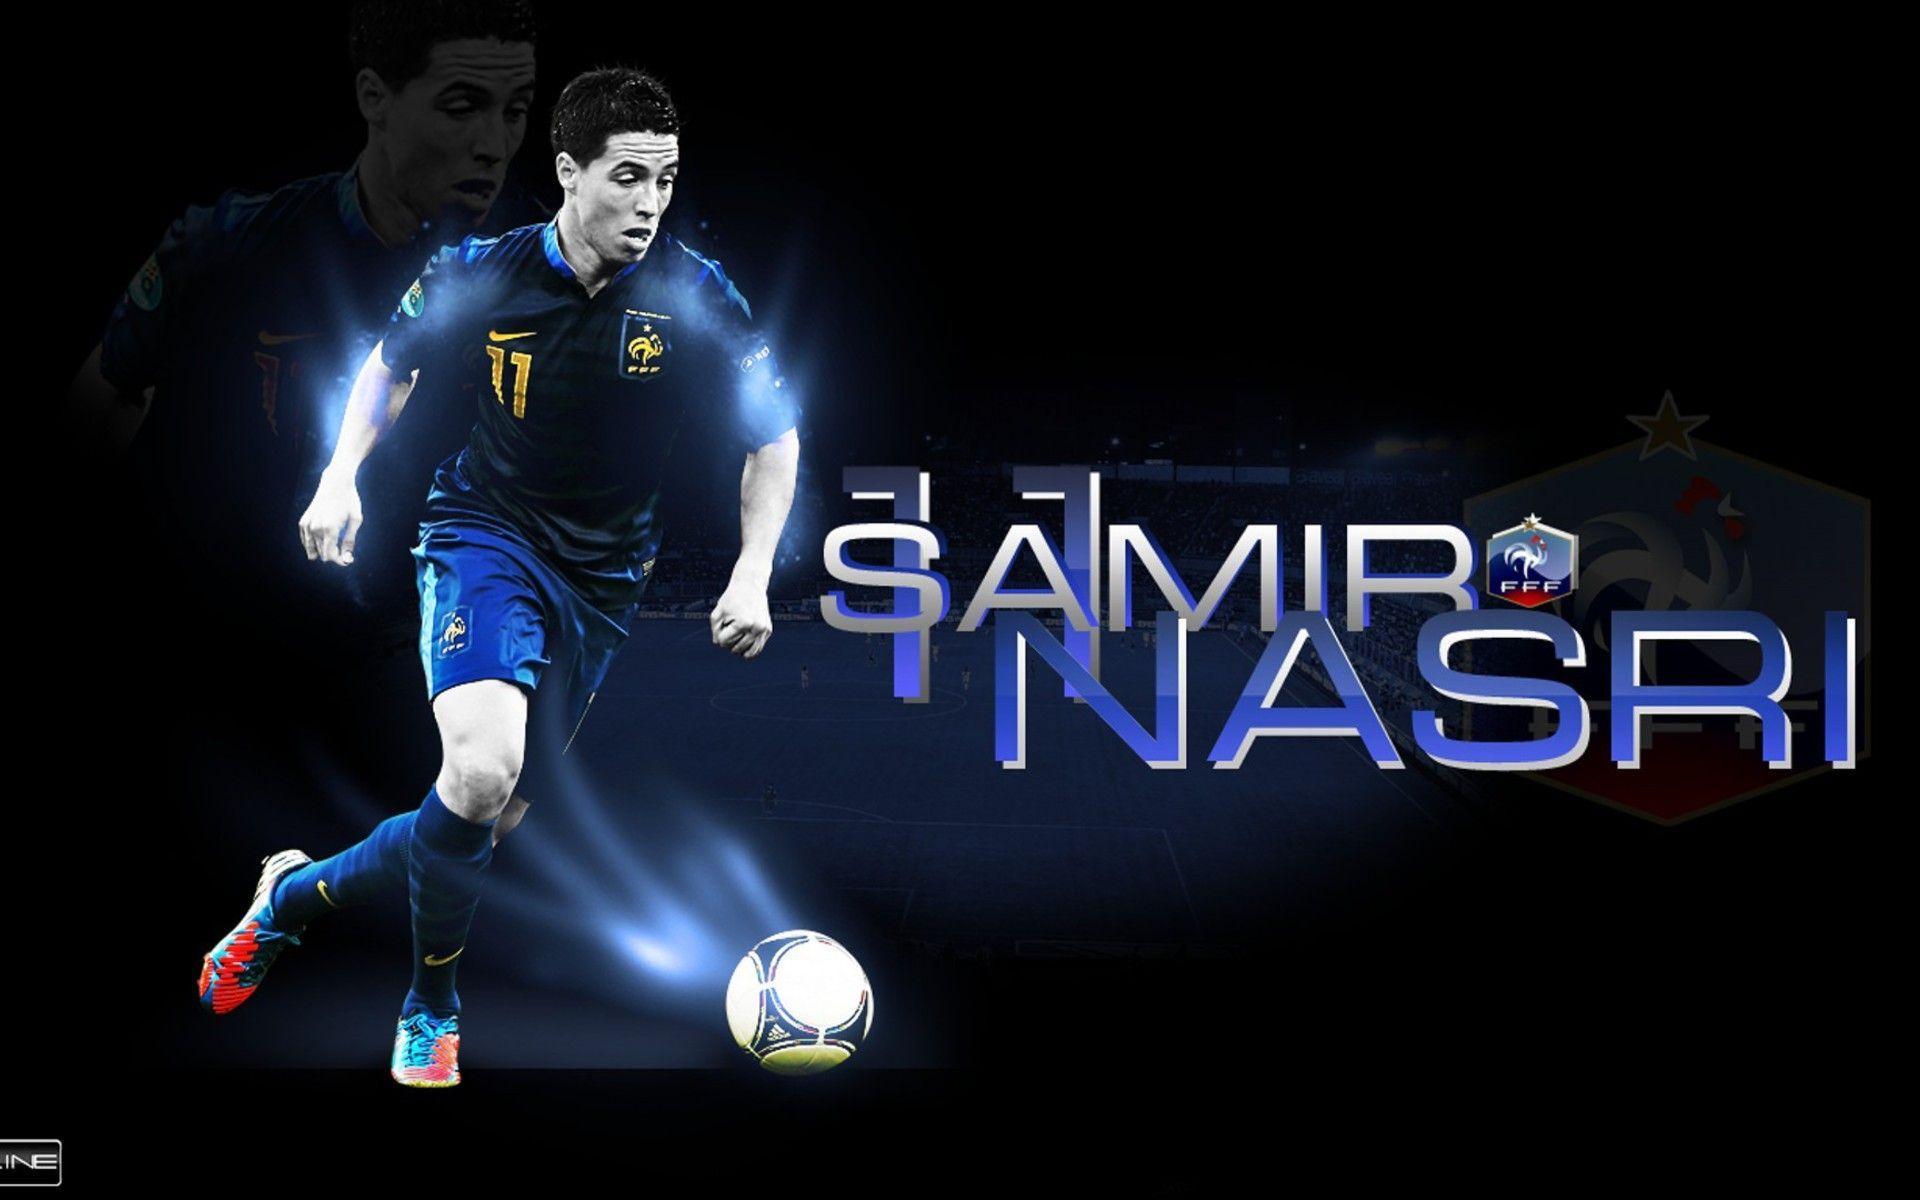 France National Football Team Teams Background 2